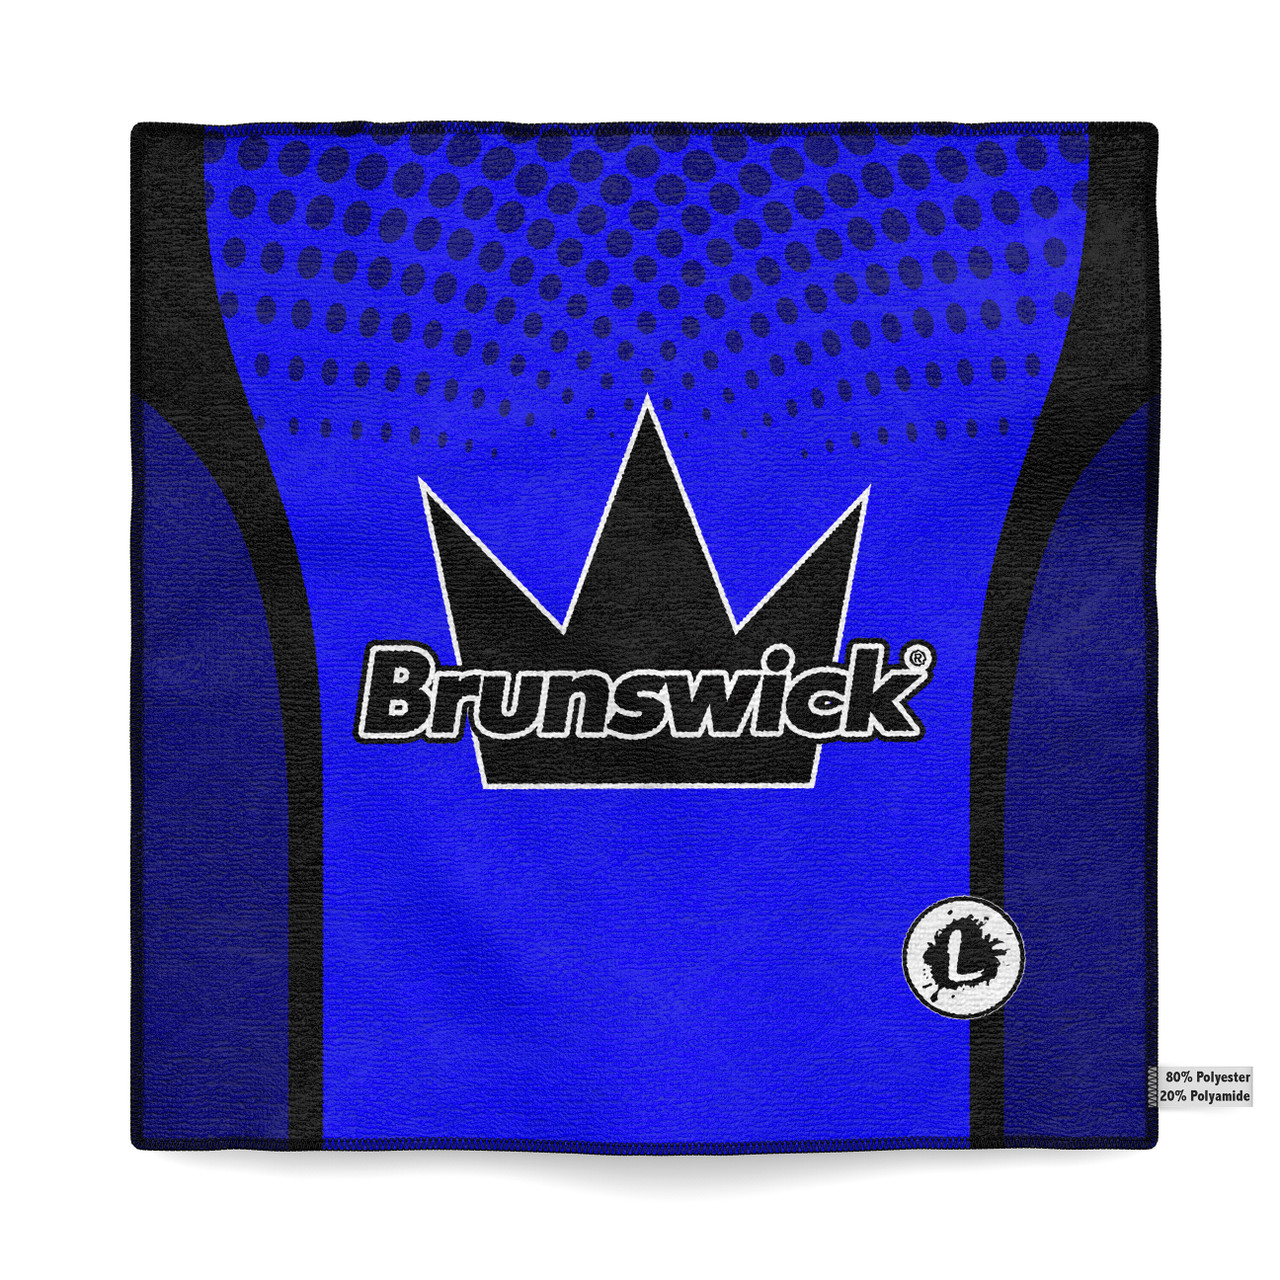 Brunswick DS Towel Style 0310